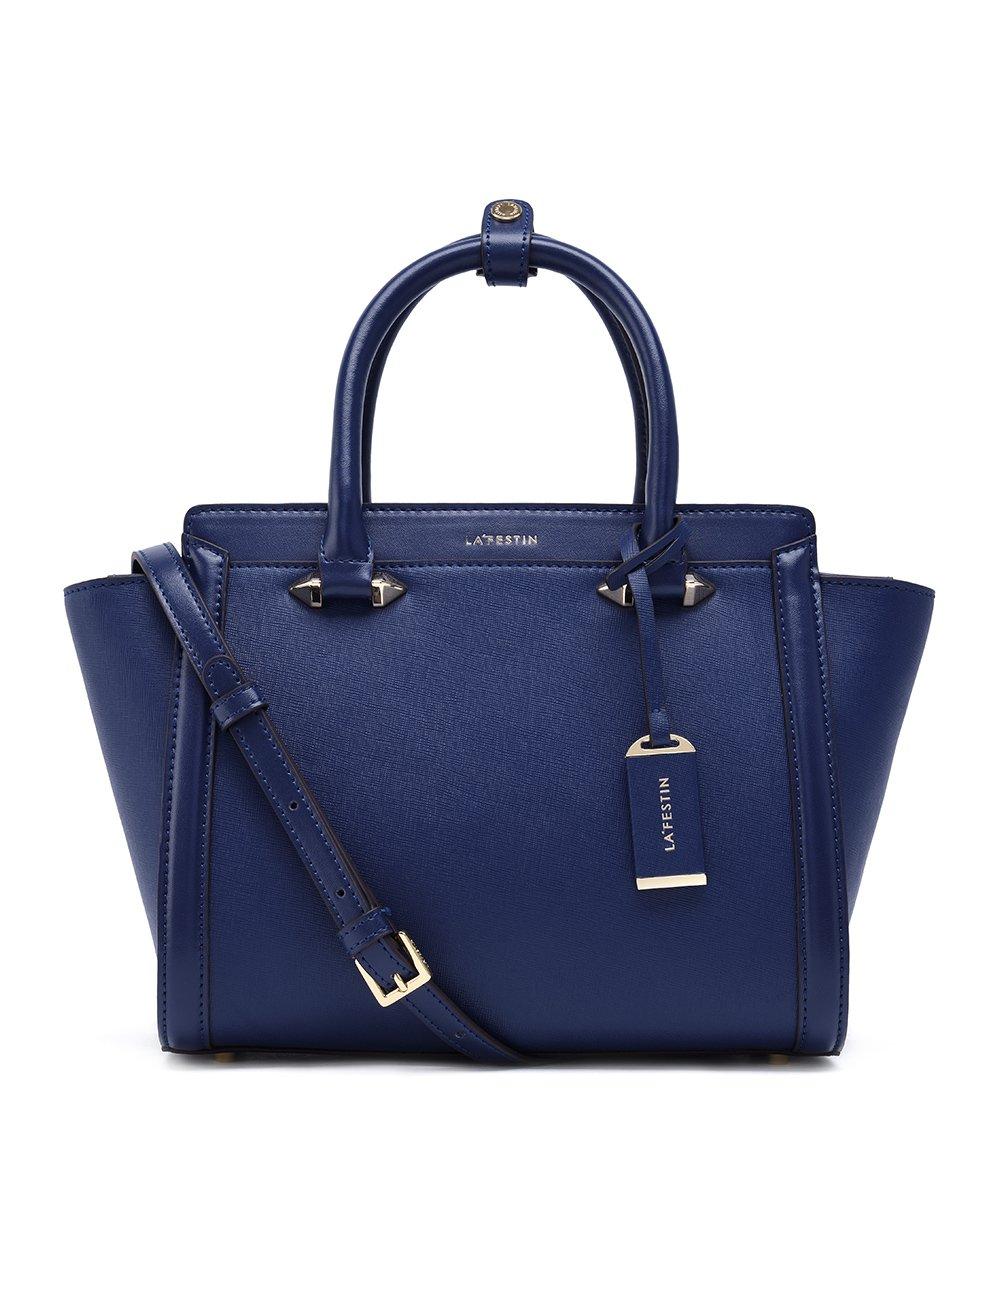 LA'FESTIN Genuine Leather Bag for Women 2017 Fashion Top Handle Handbags (Blue)